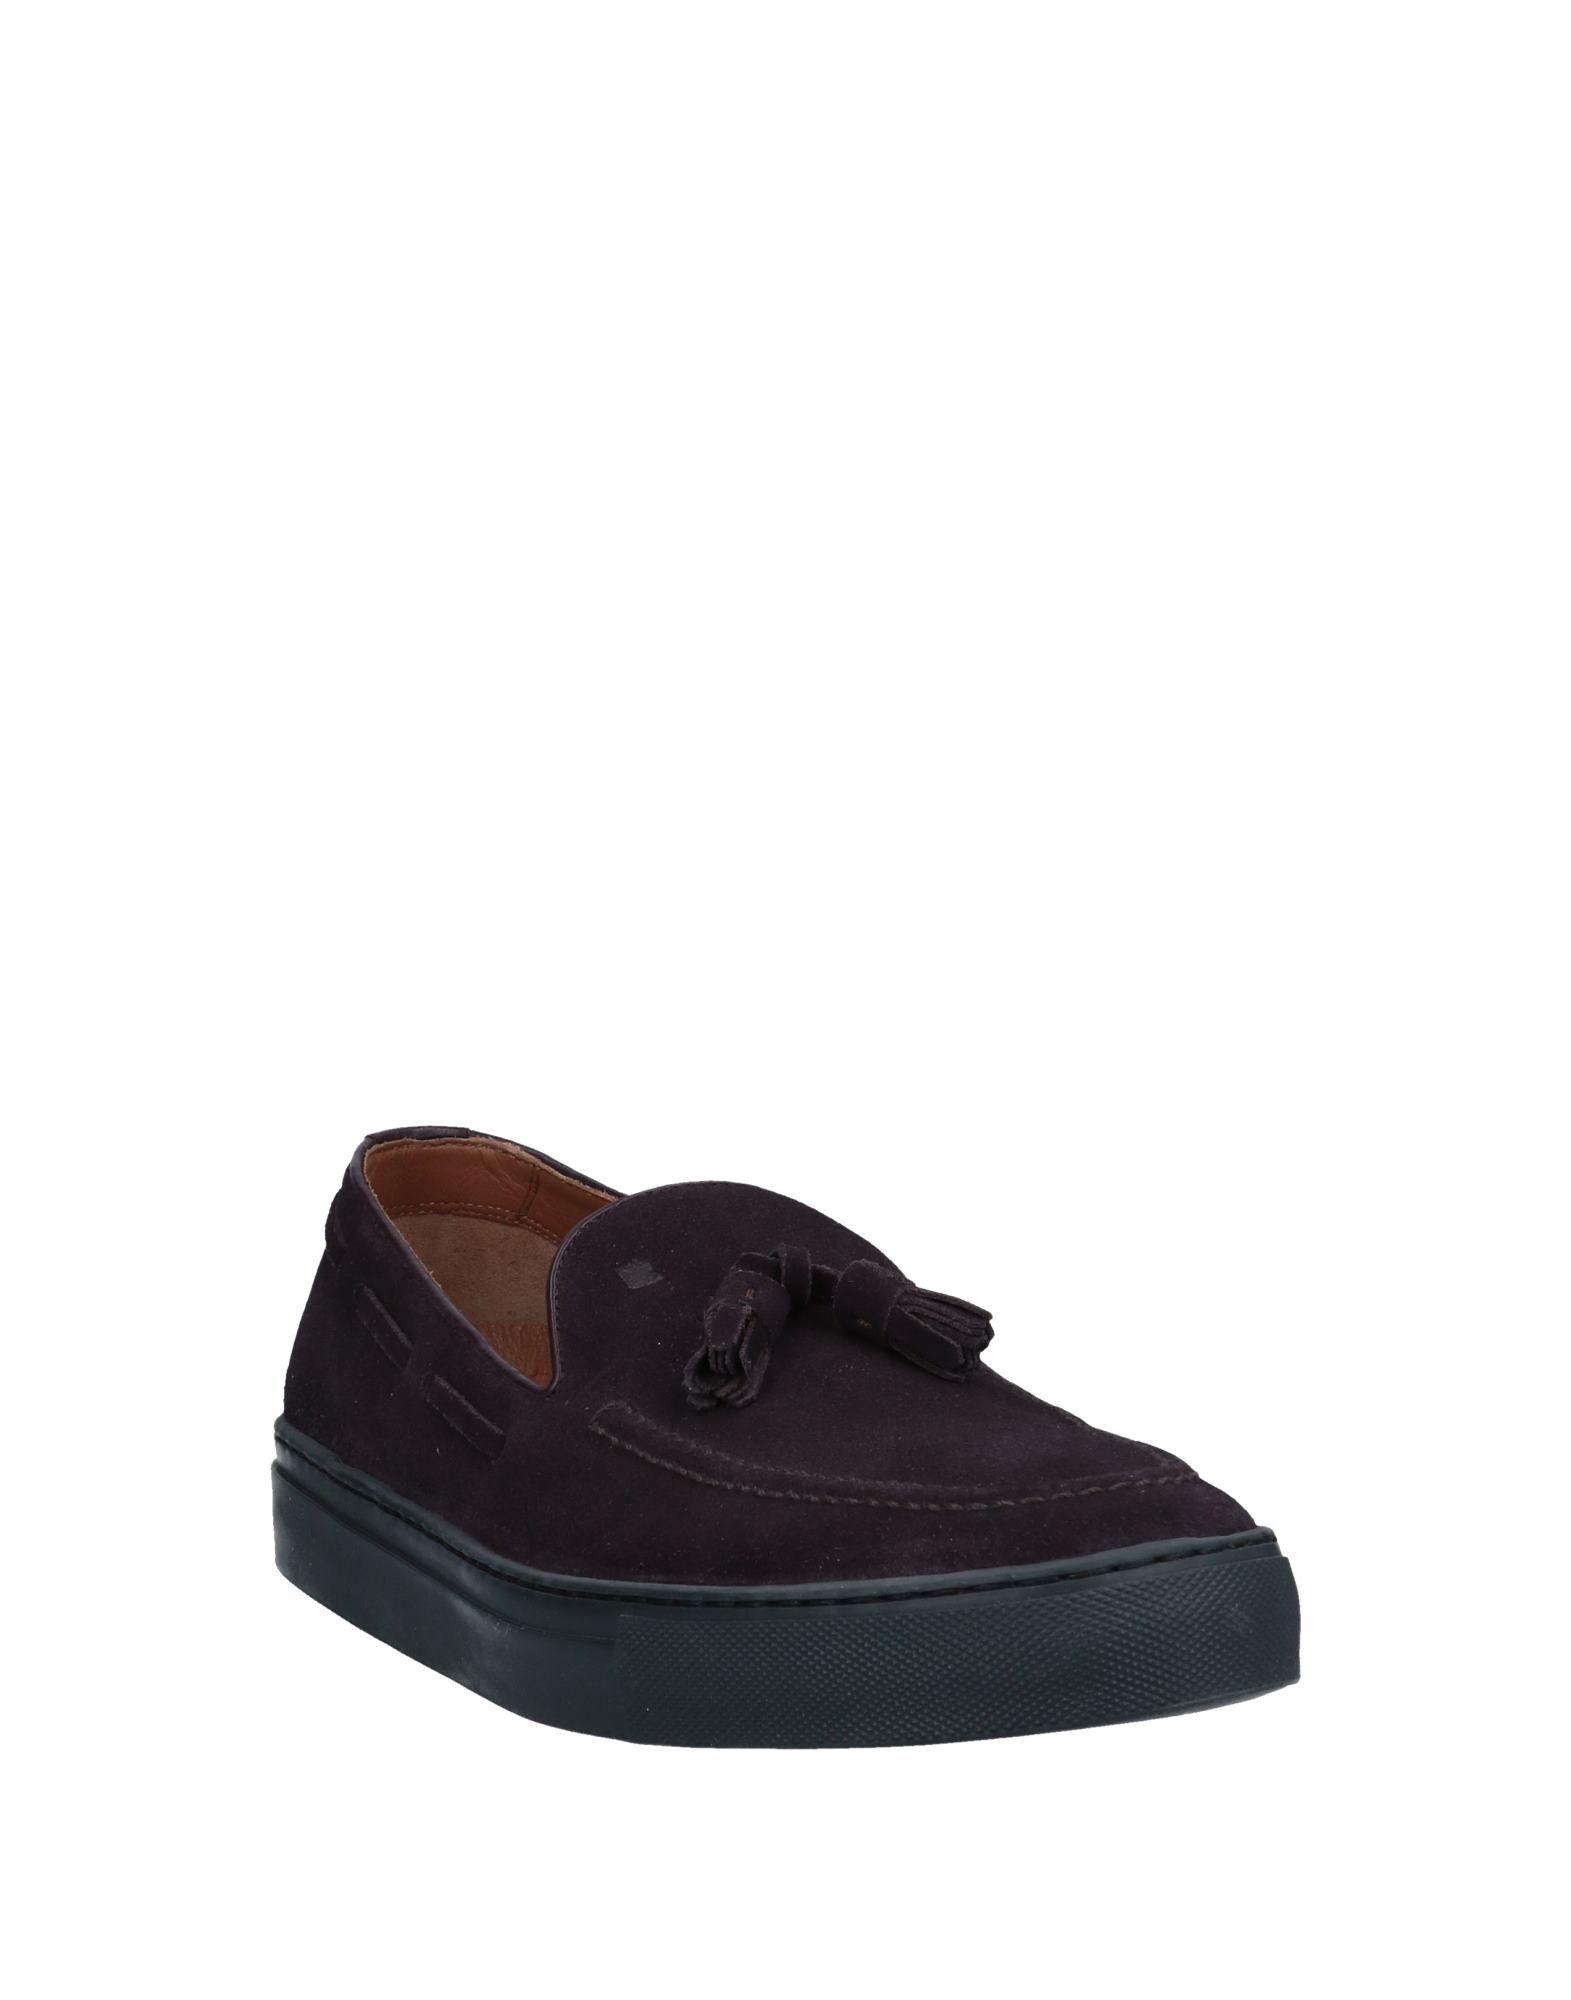 Fratelli Rossetti Mokassins Herren  11550196IT Gute Qualität beliebte Schuhe